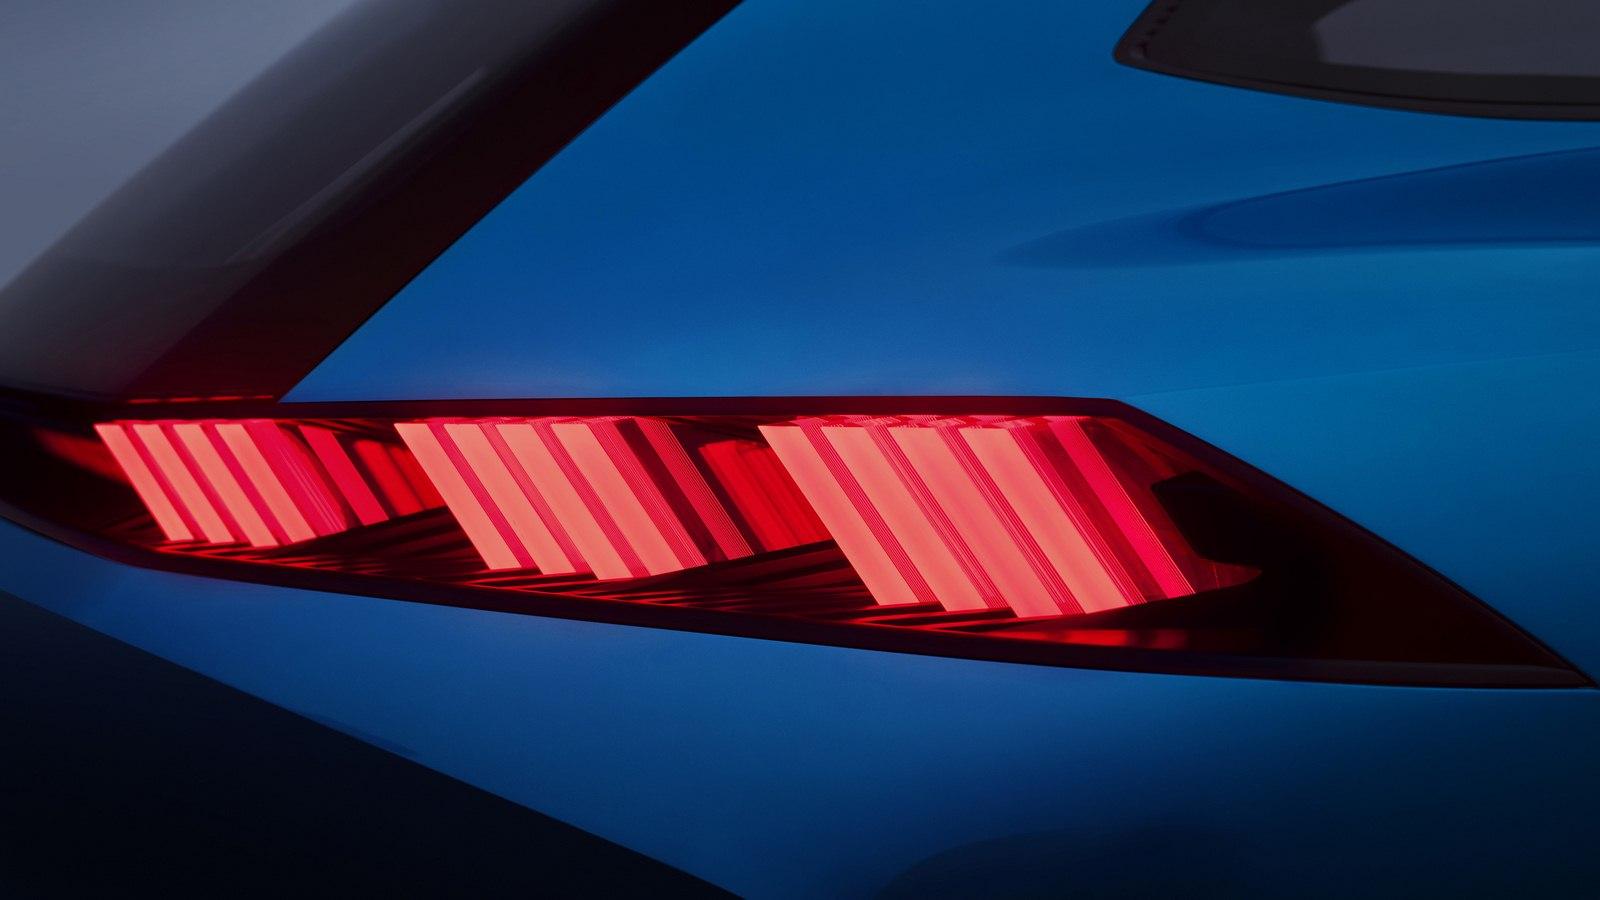 2017-Peugeot-Instinct-Concept-07